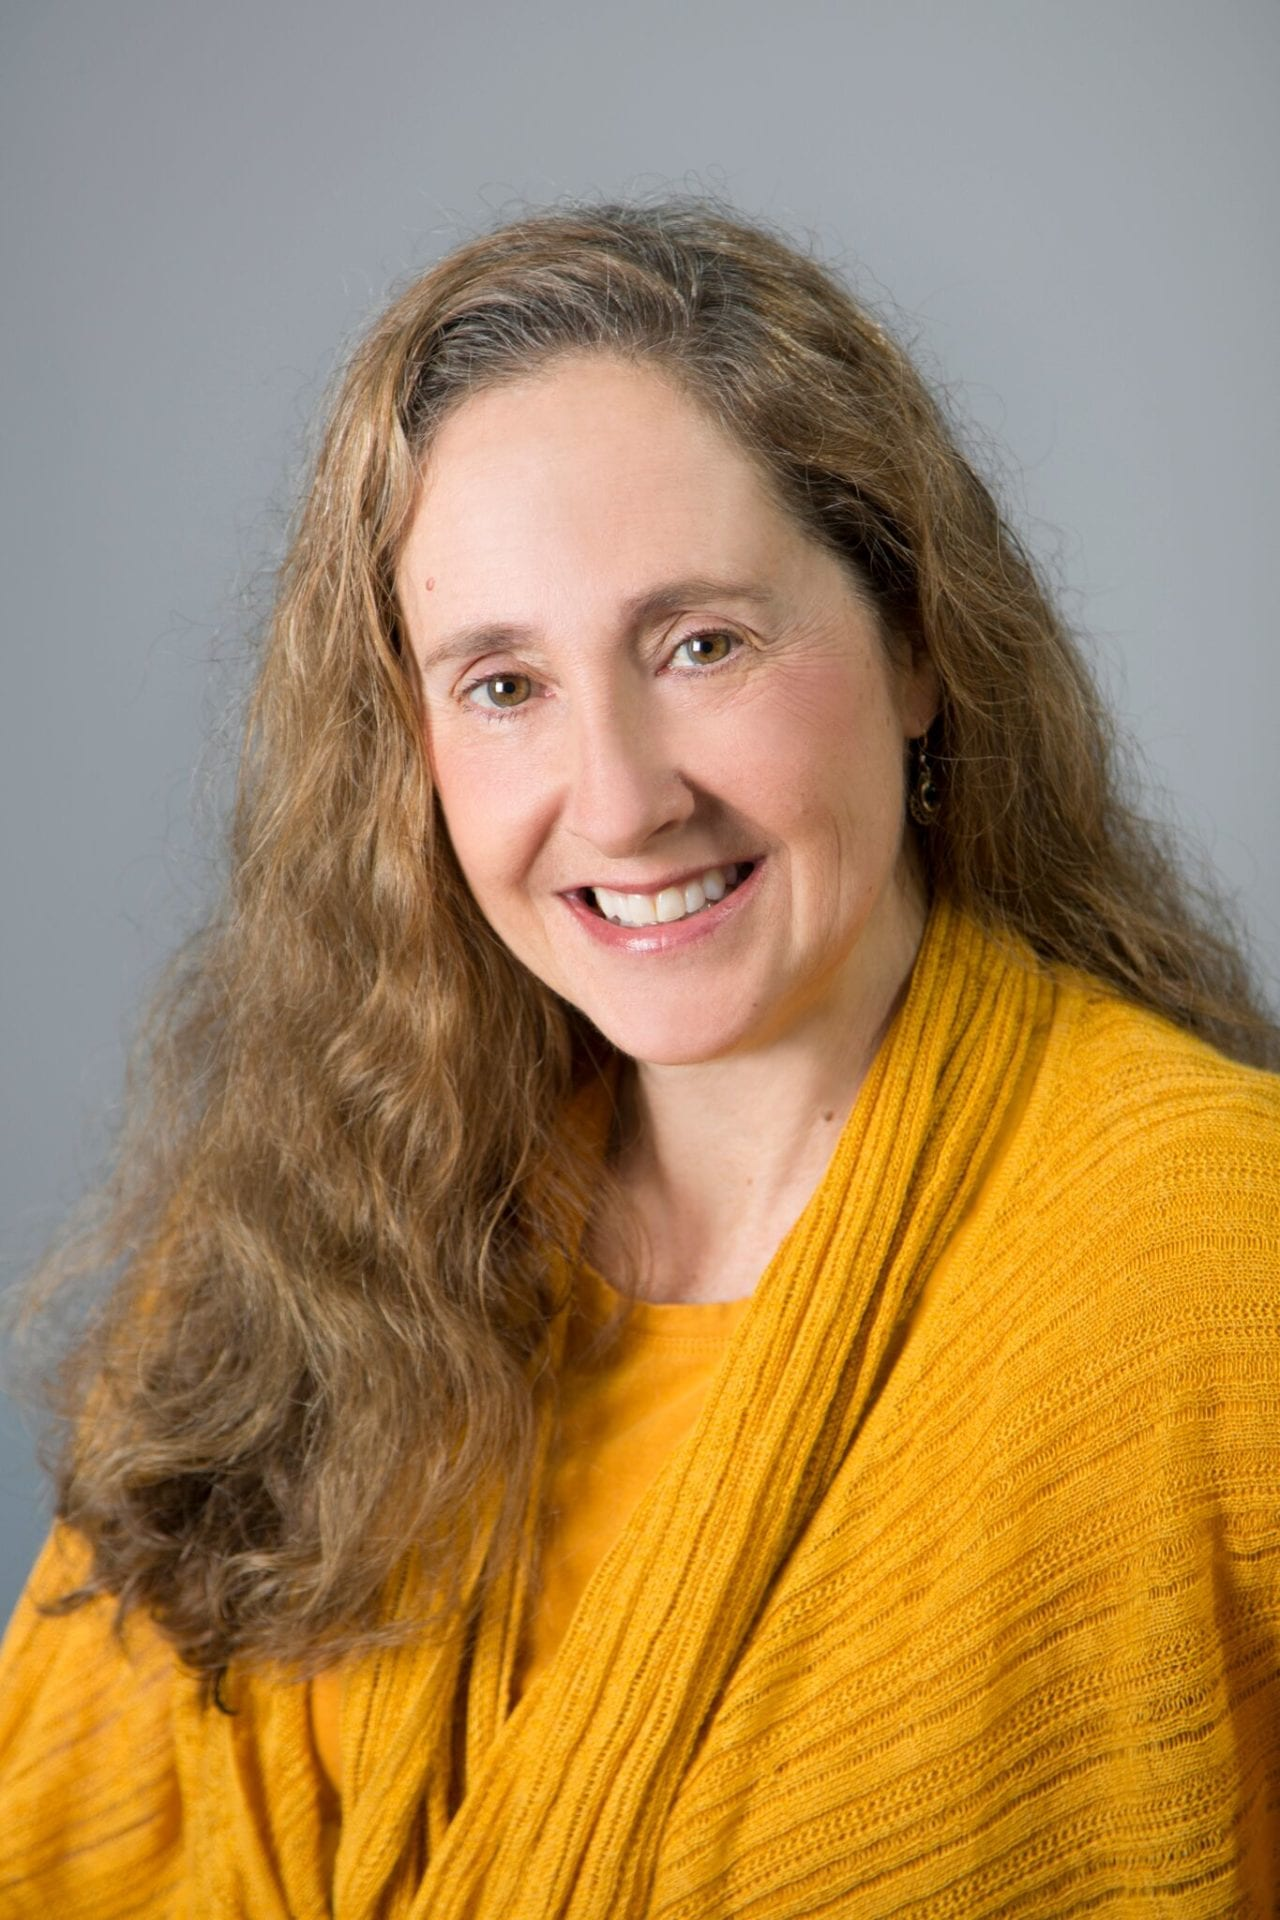 About Medora Regan – Senior Account Manager